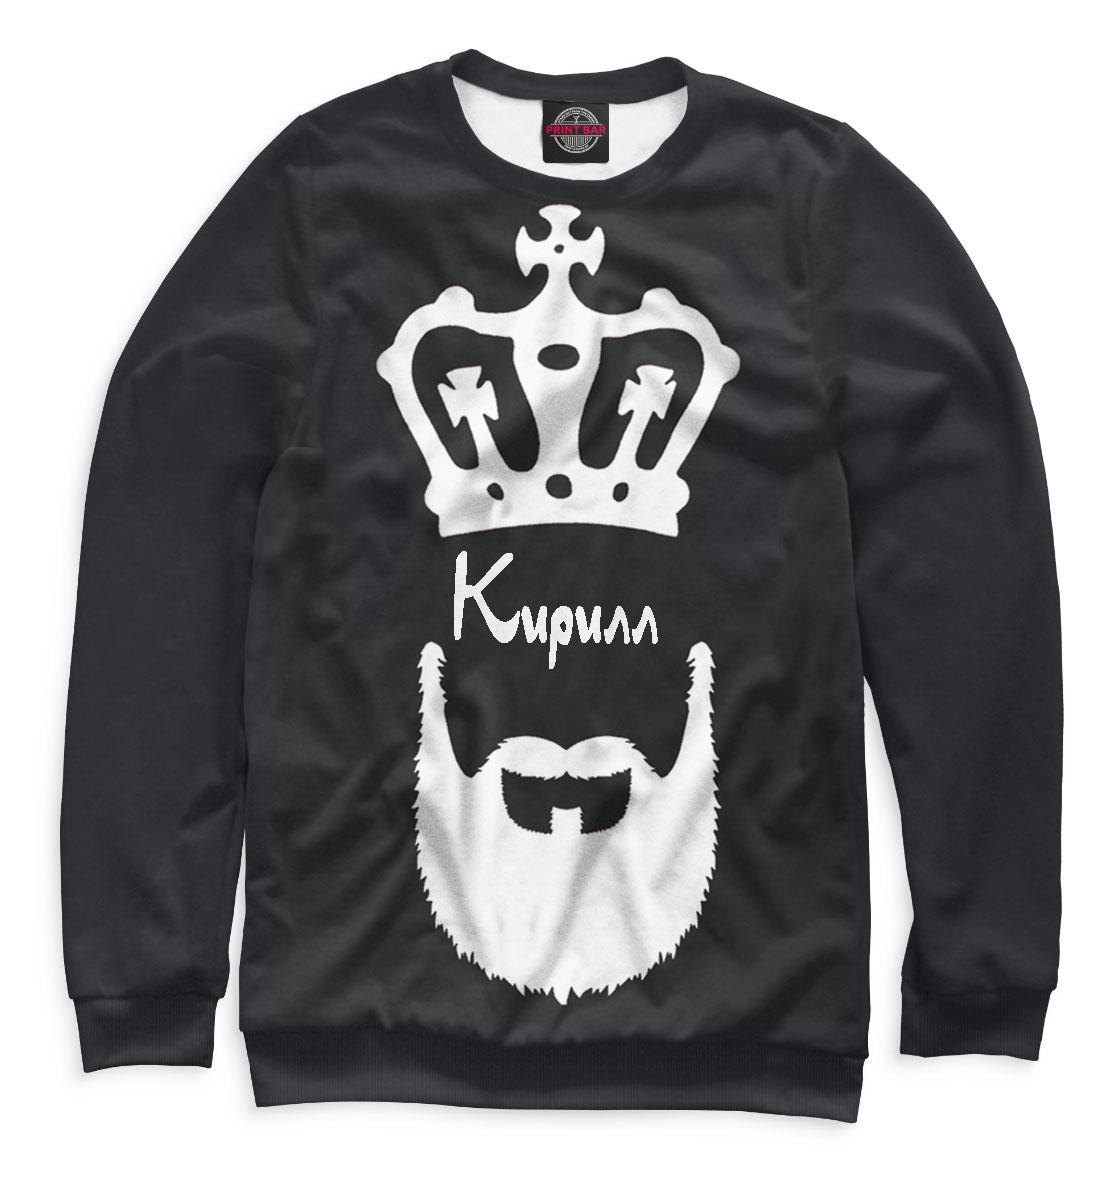 Купить Кирилл — борода и корона, Printbar, Свитшоты, KIR-677068-swi